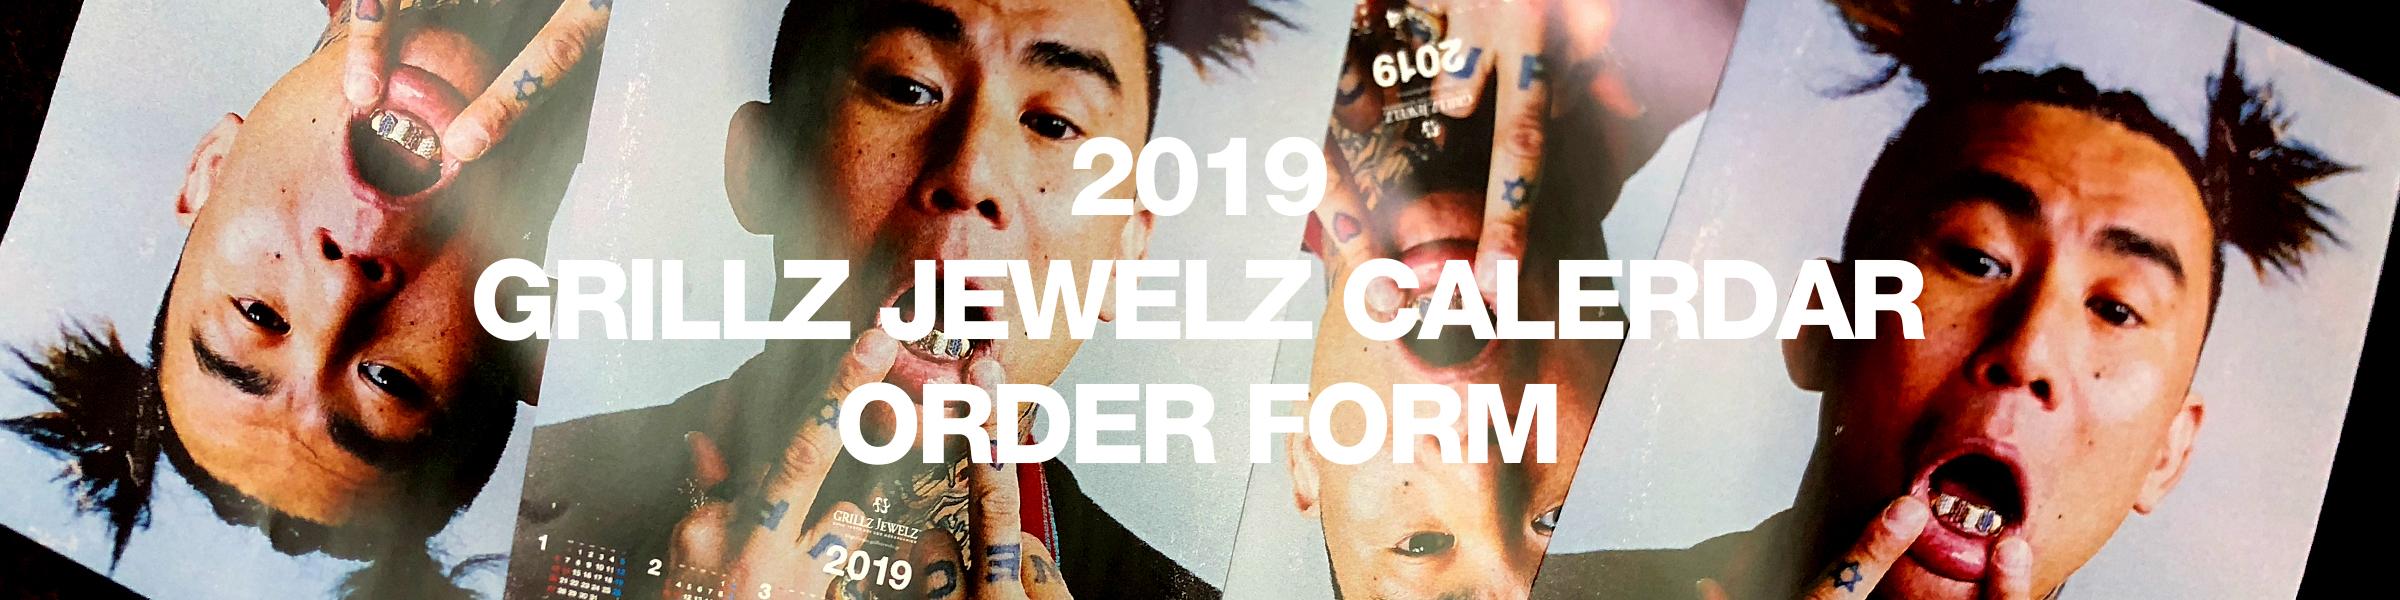 2019 CALENDAR ORDER FORM